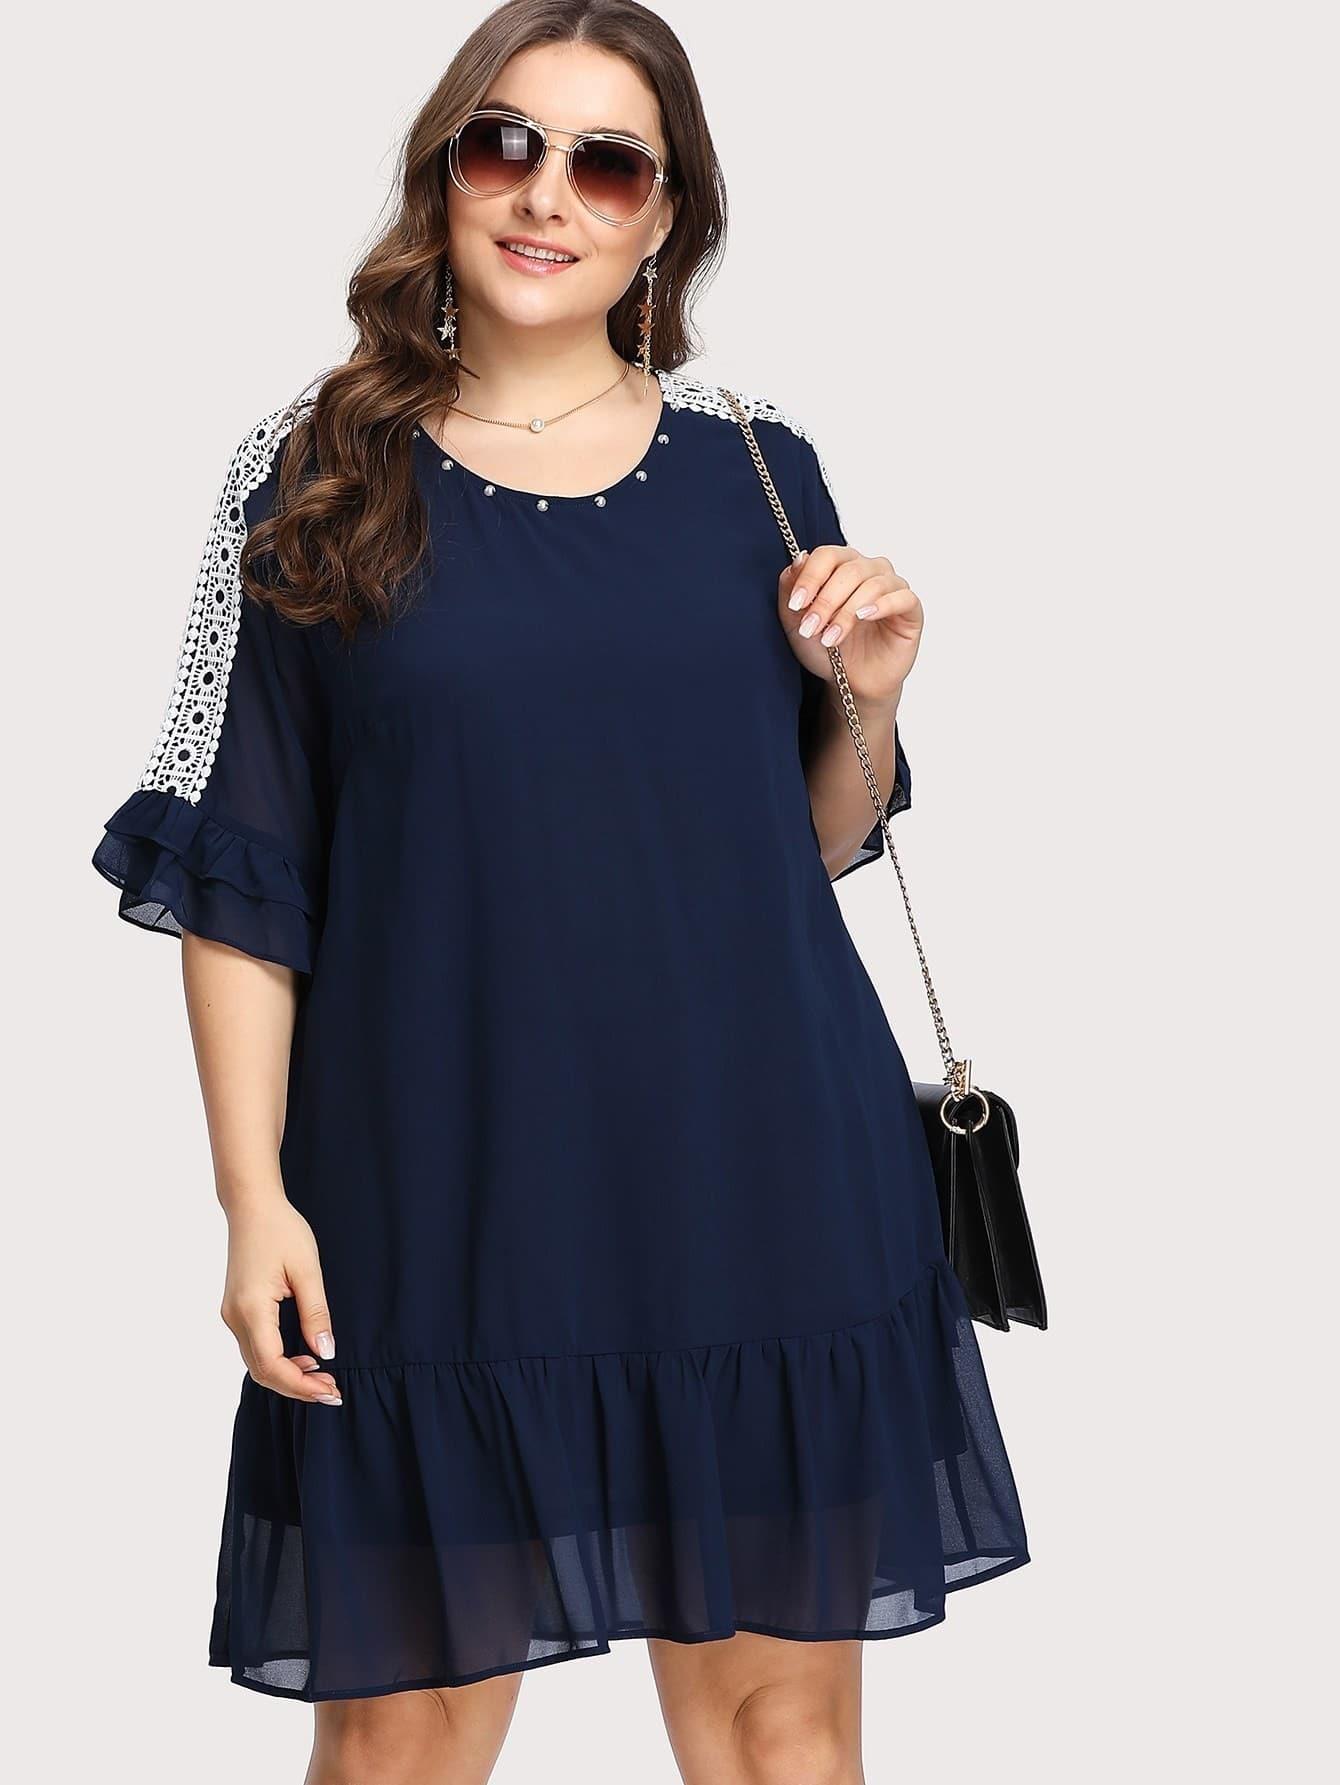 Beading Neck Lace Accent Ruffle Dress dress171225466